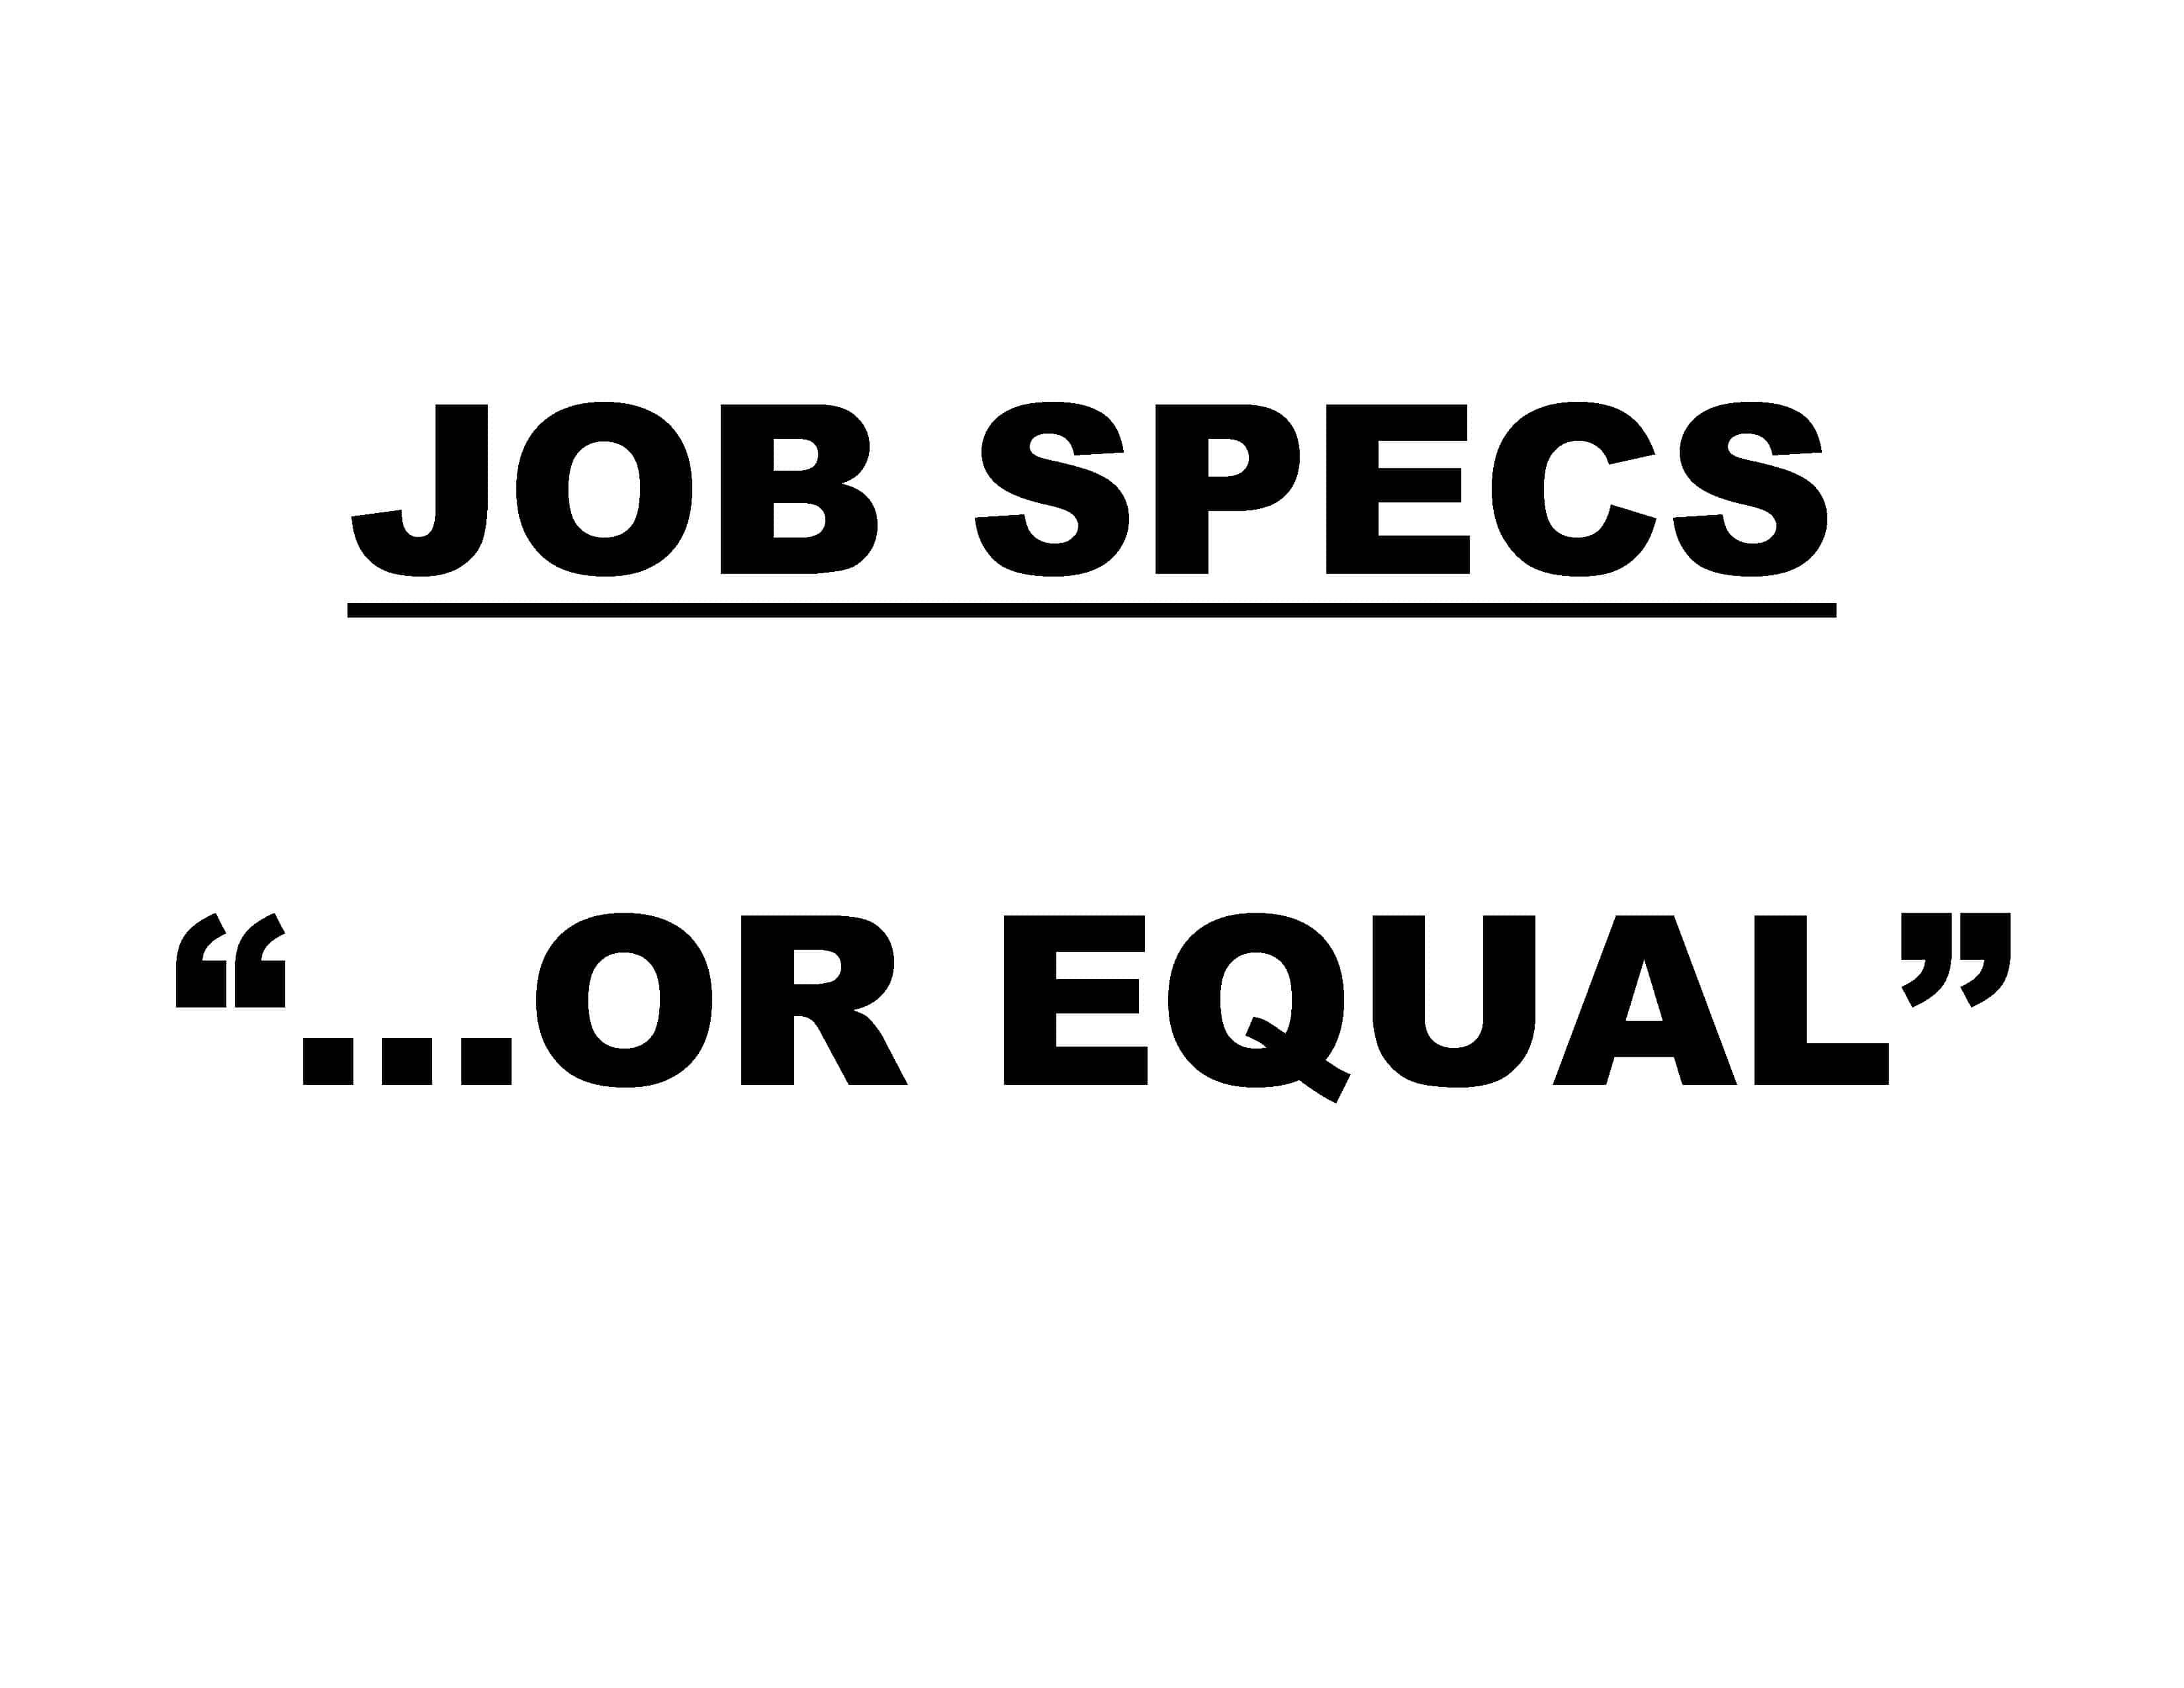 _Or_Equal__4b74327db3af9.jpg